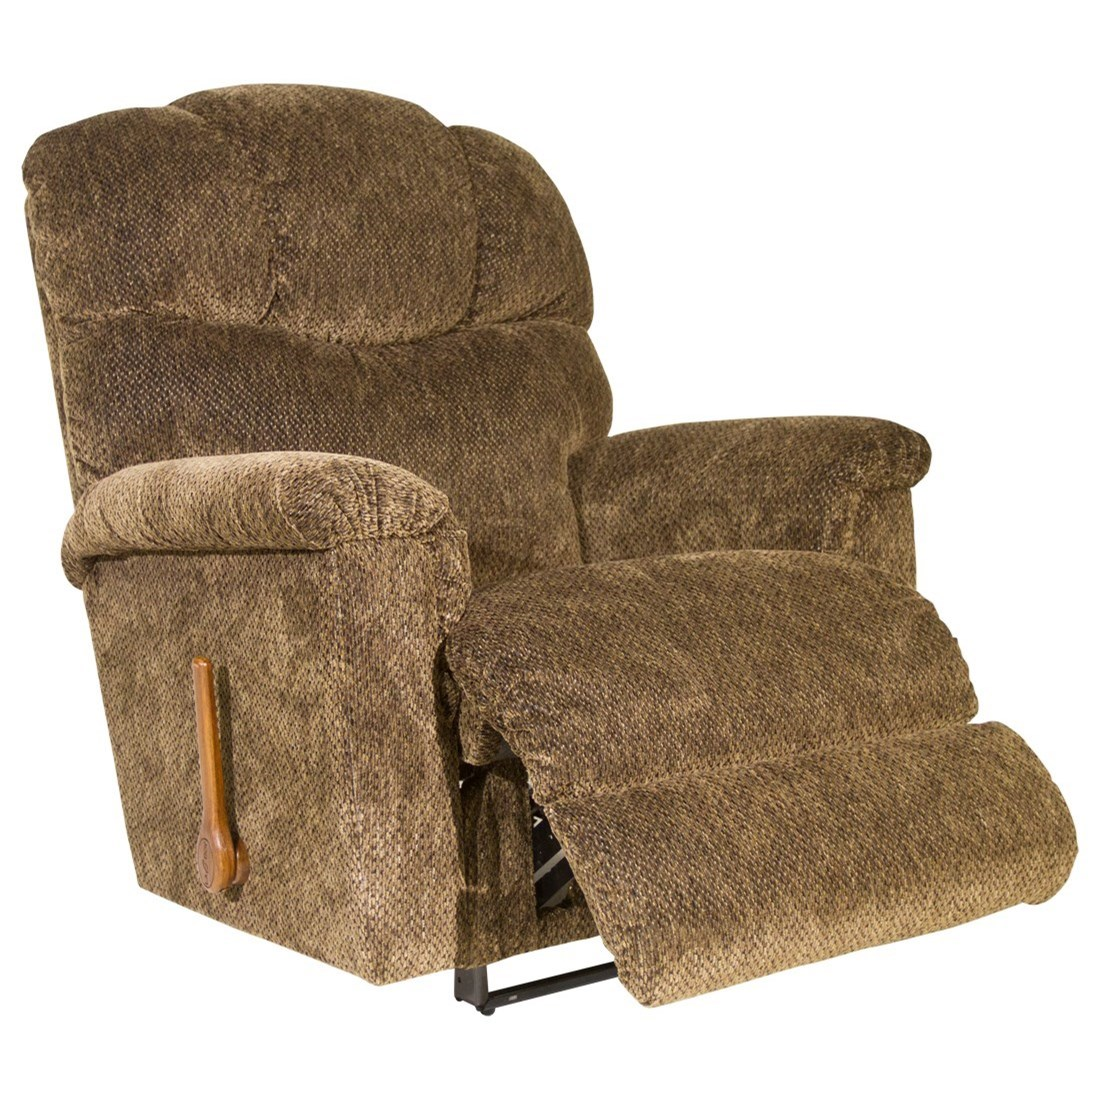 La Z Boy Lancer Reclina Rocker 174 Reclining Chair Vandrie